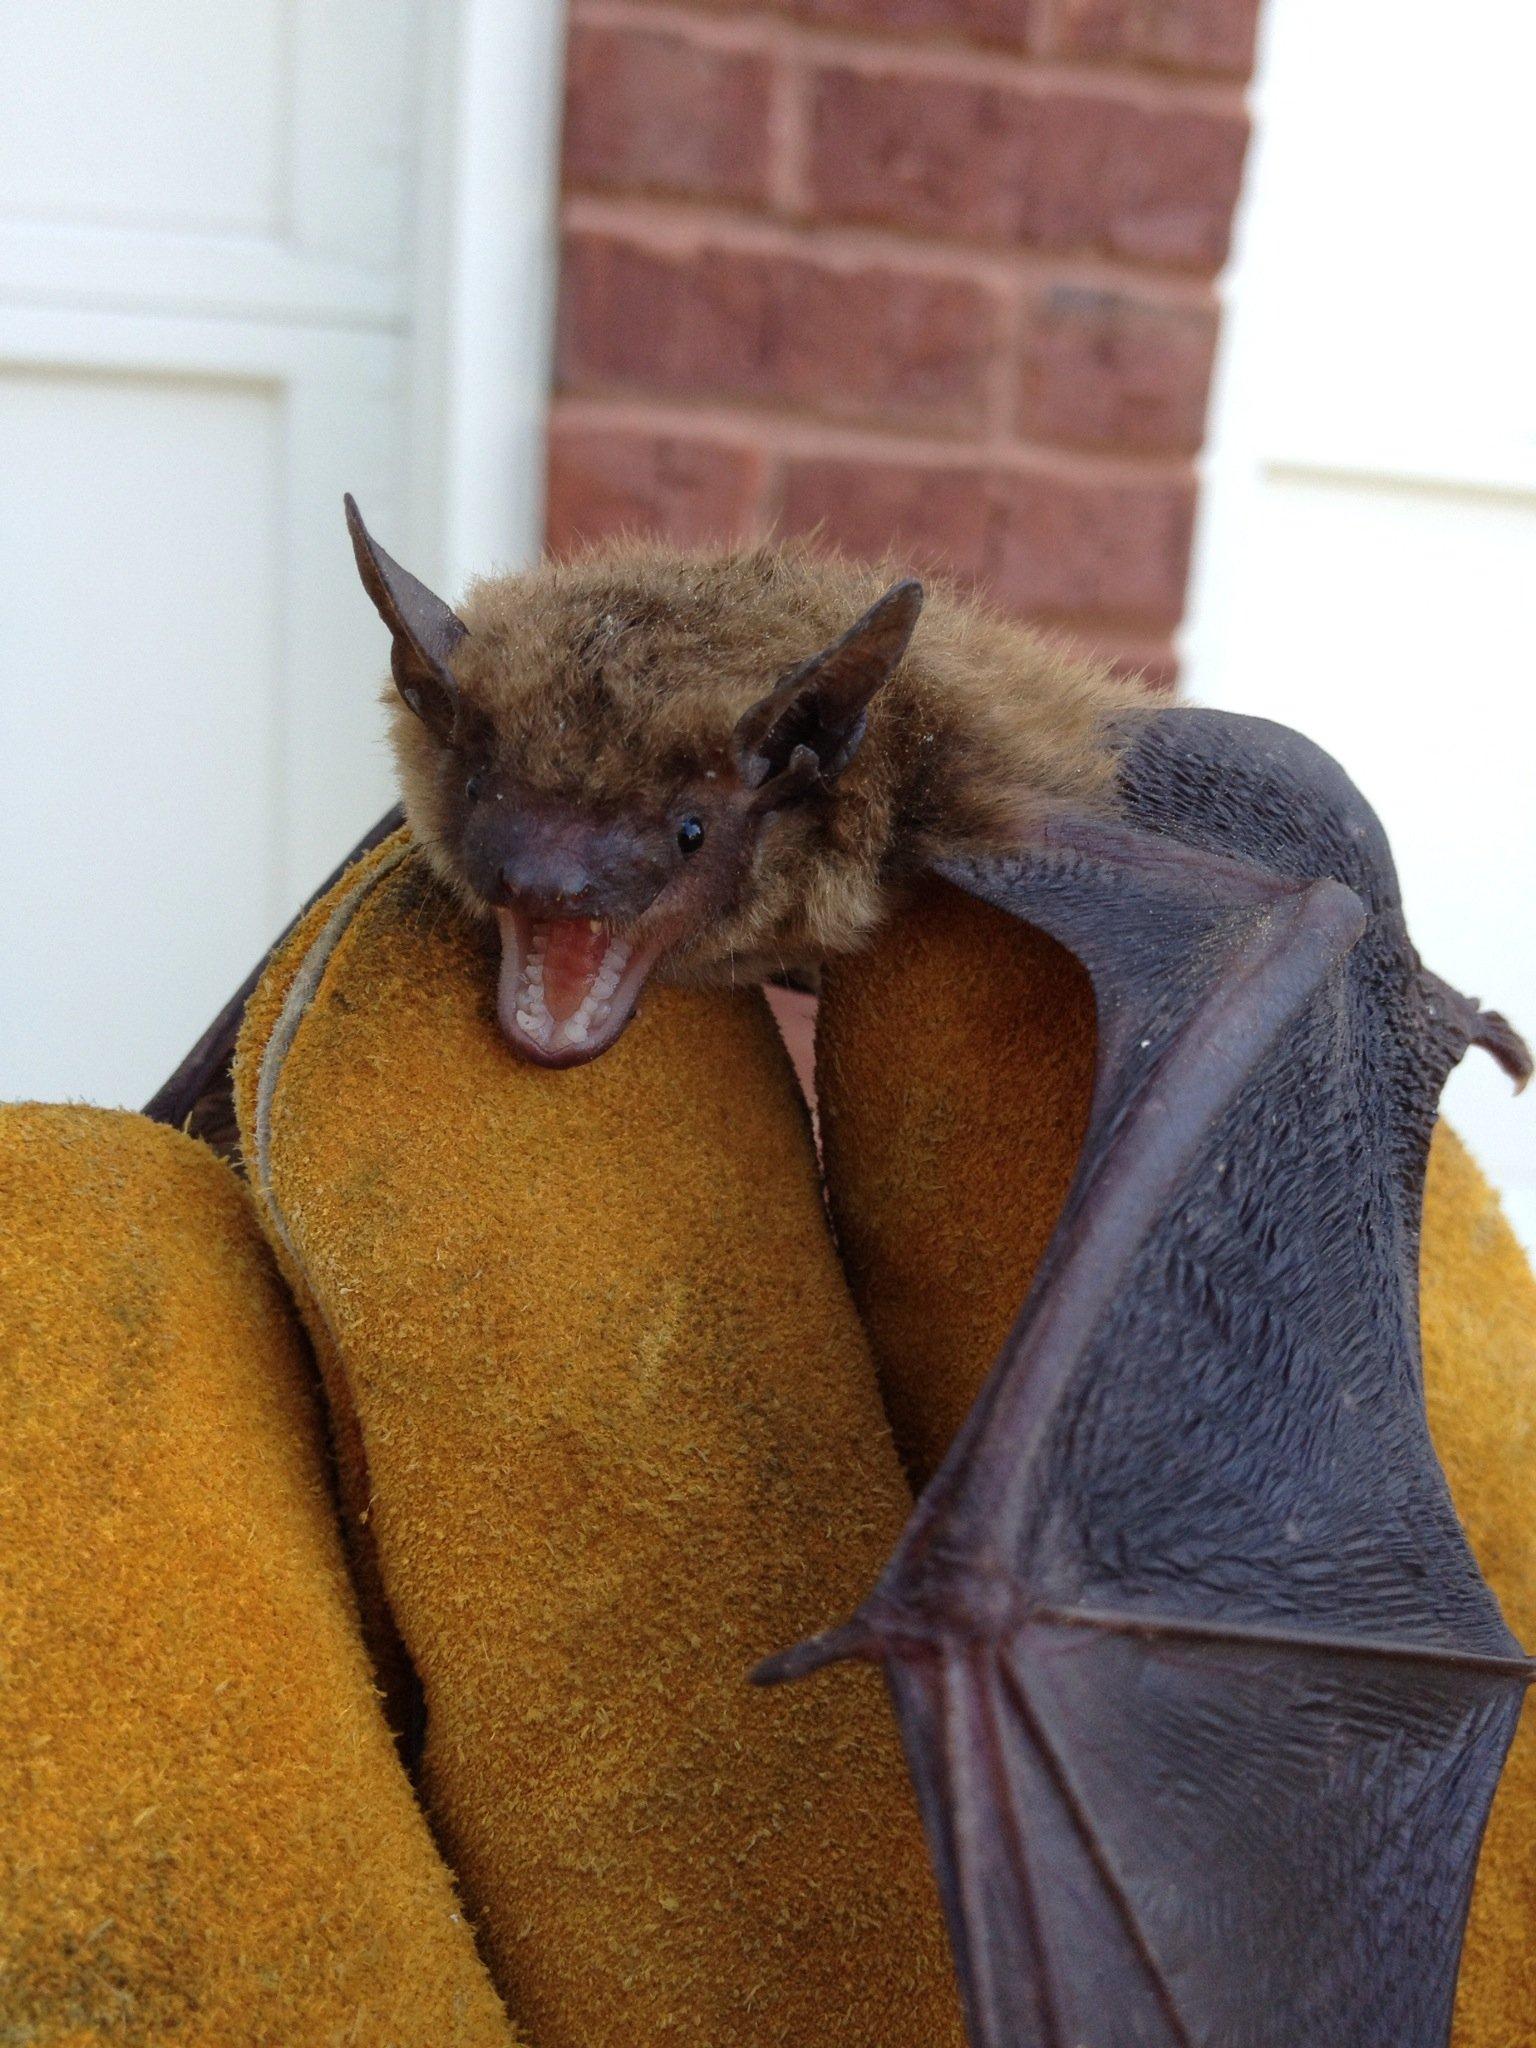 bat hand removed